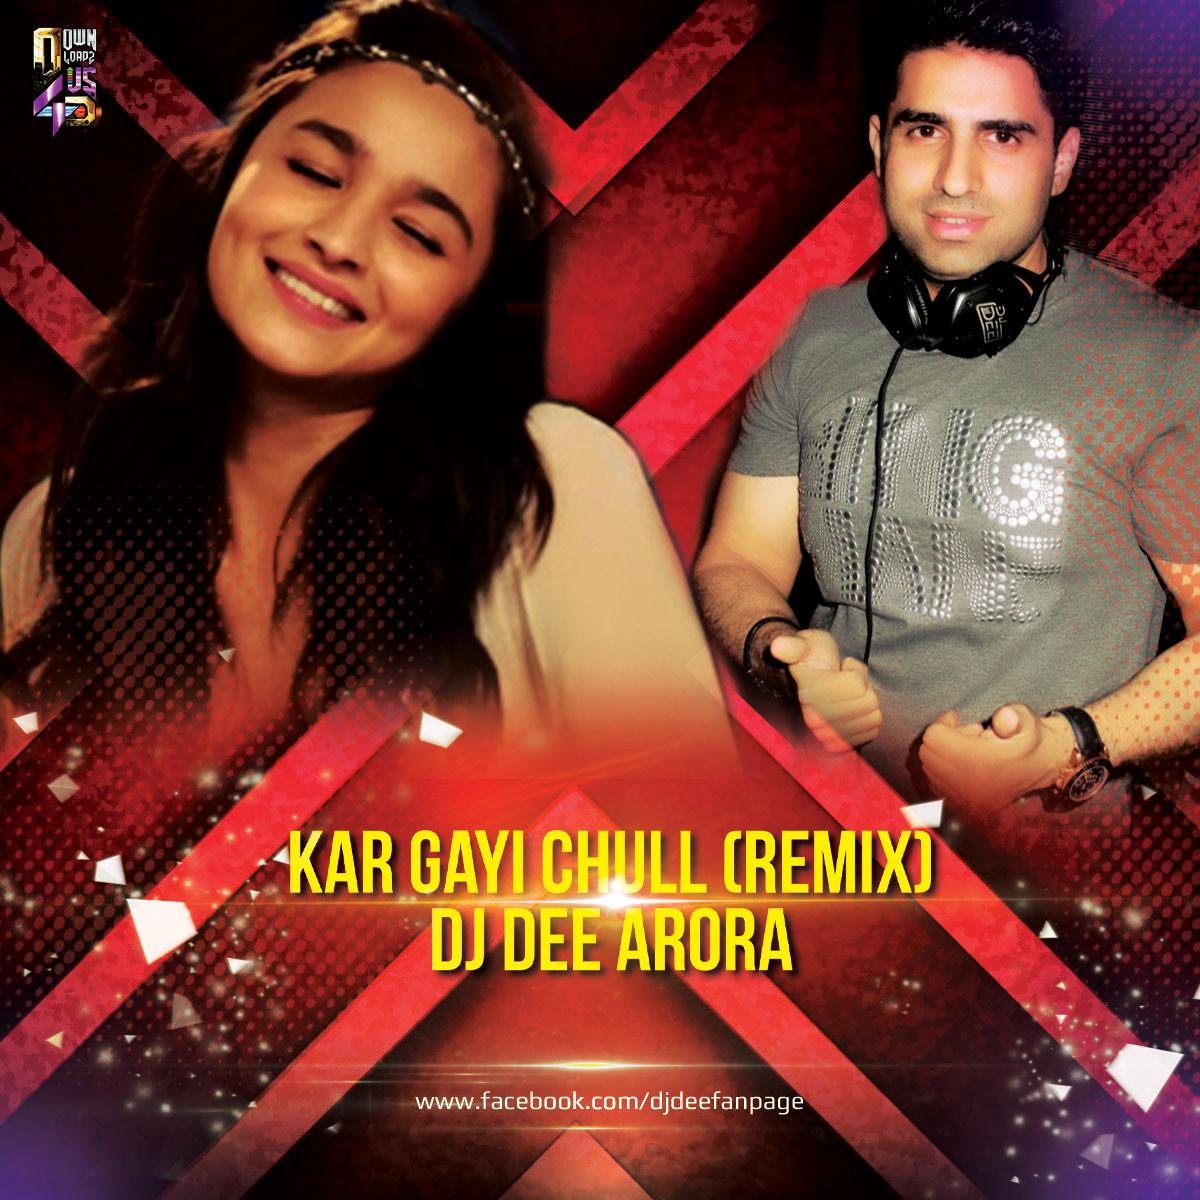 Daru Badnam Dj Remix Sapna: DJ Dee Arora (Remix